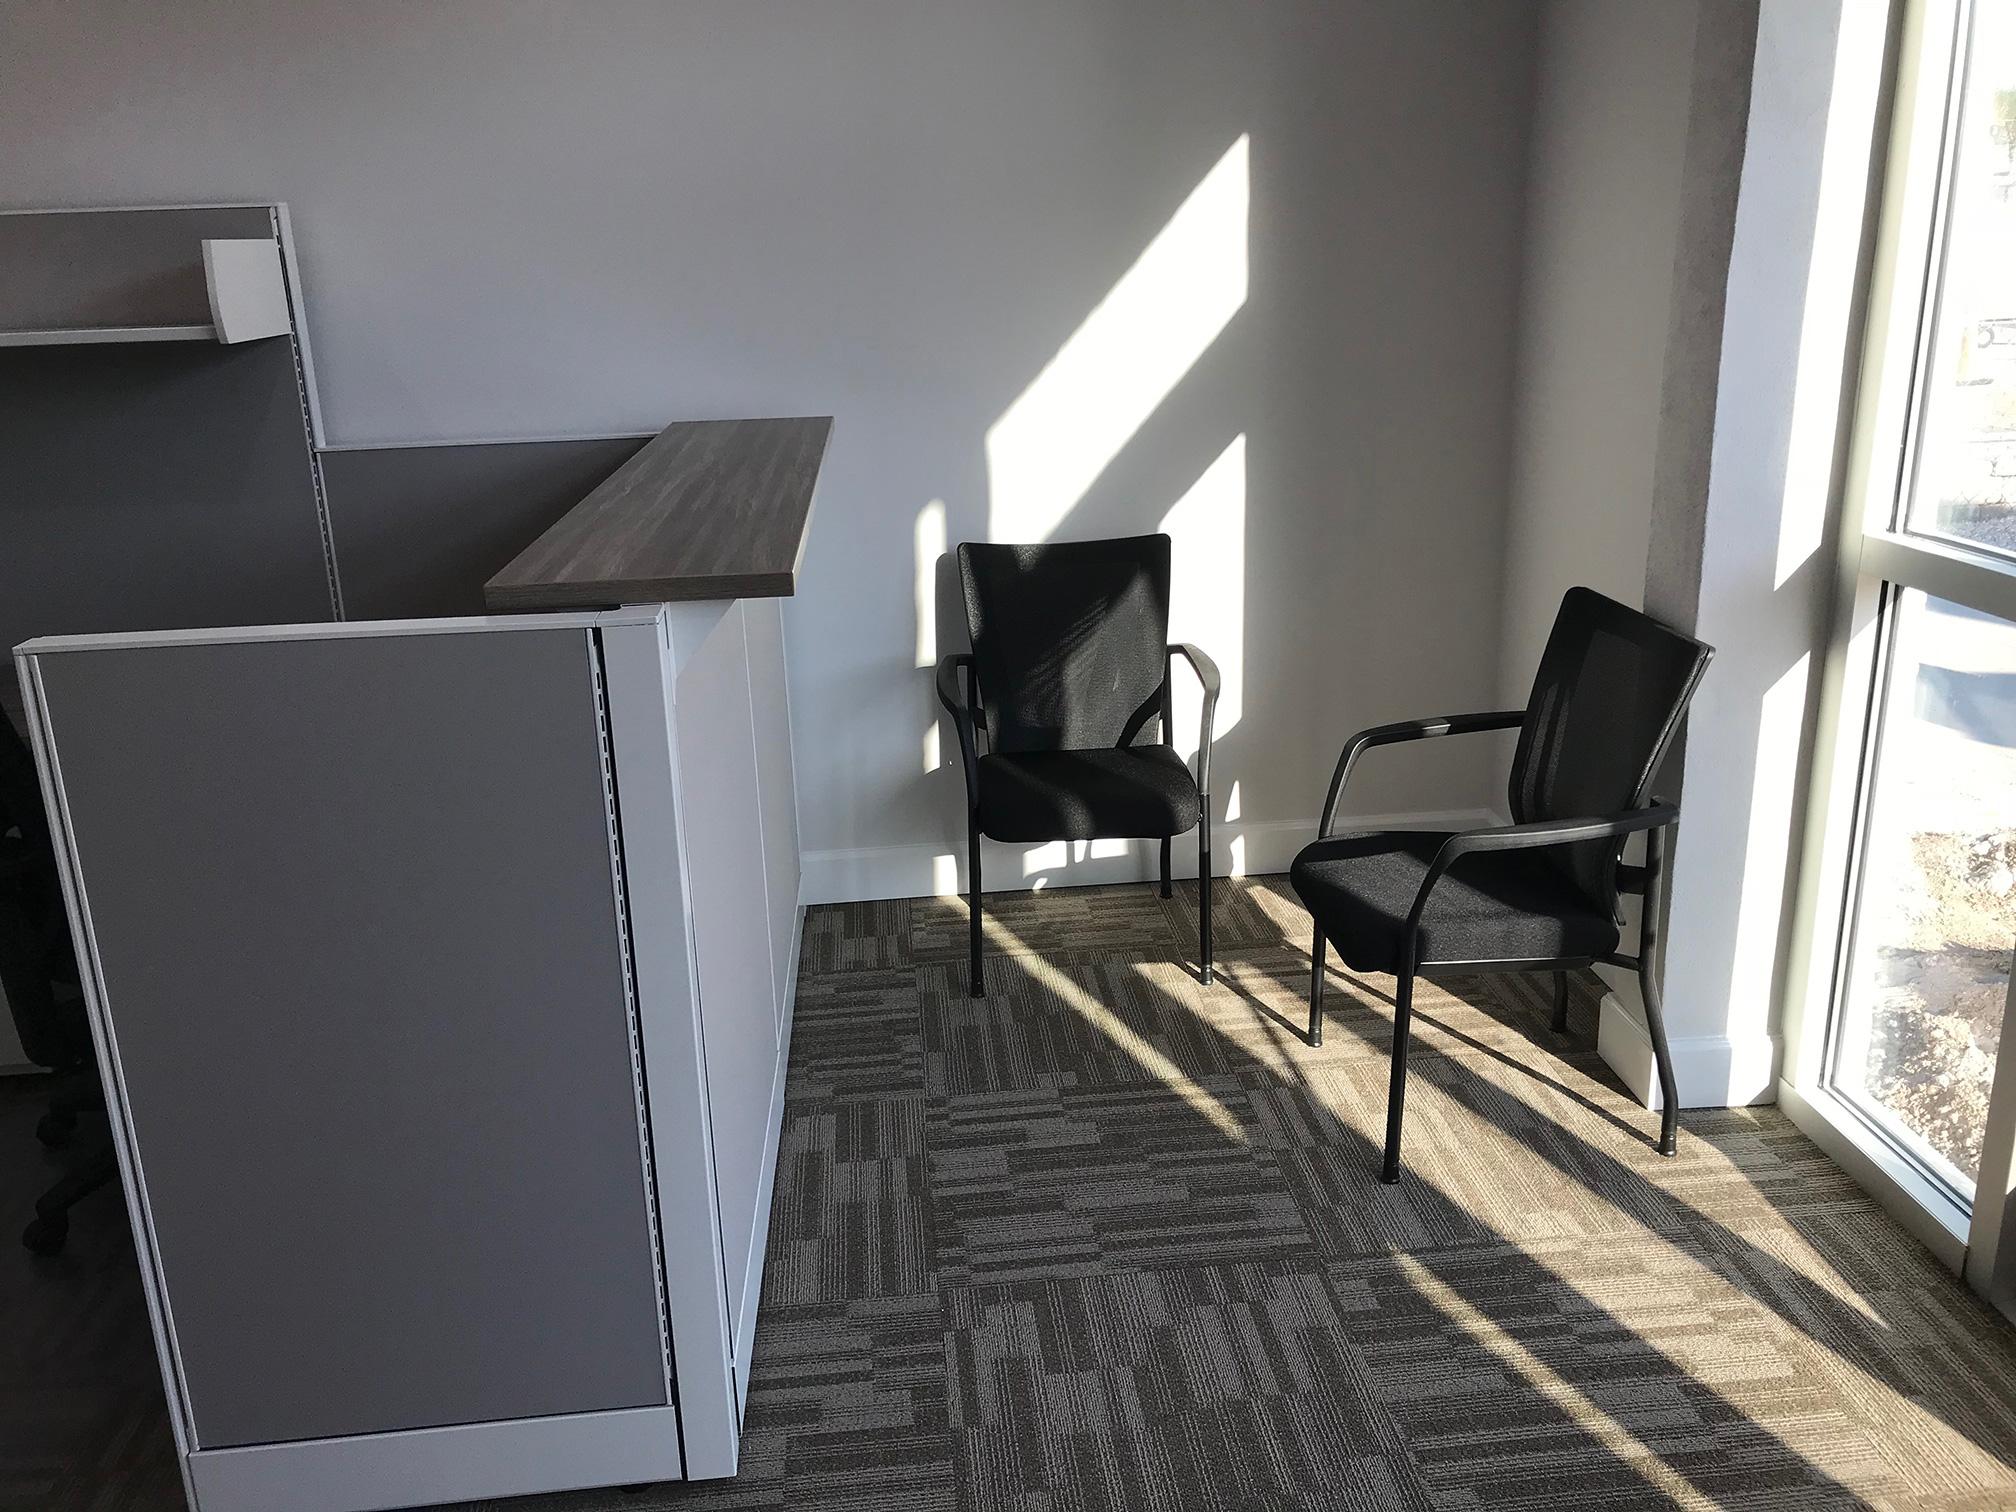 office-seating-manasota-office-supplies-llc.jpg